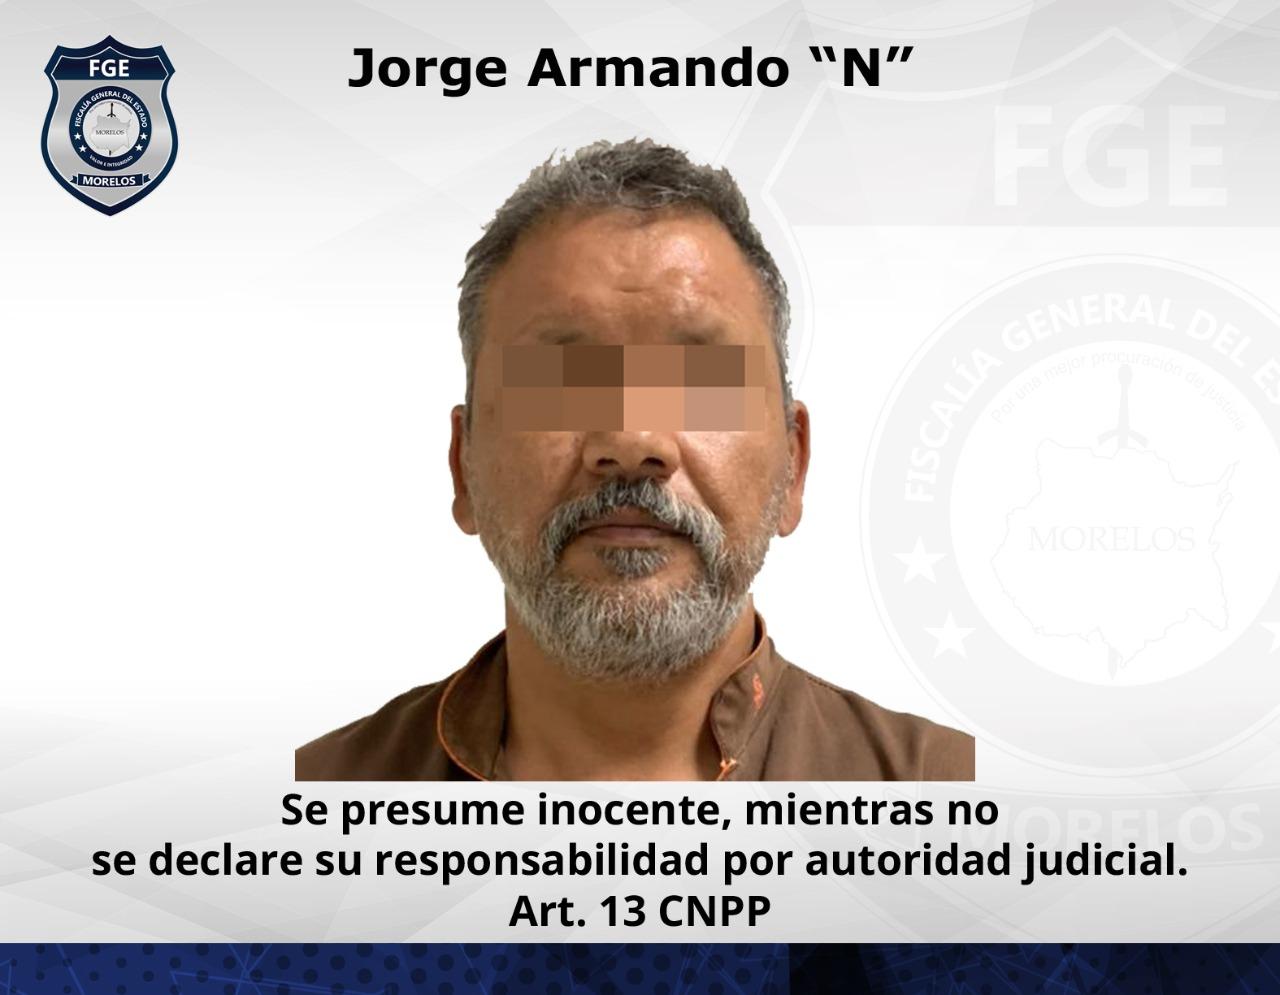 JORGE ARMANDO N